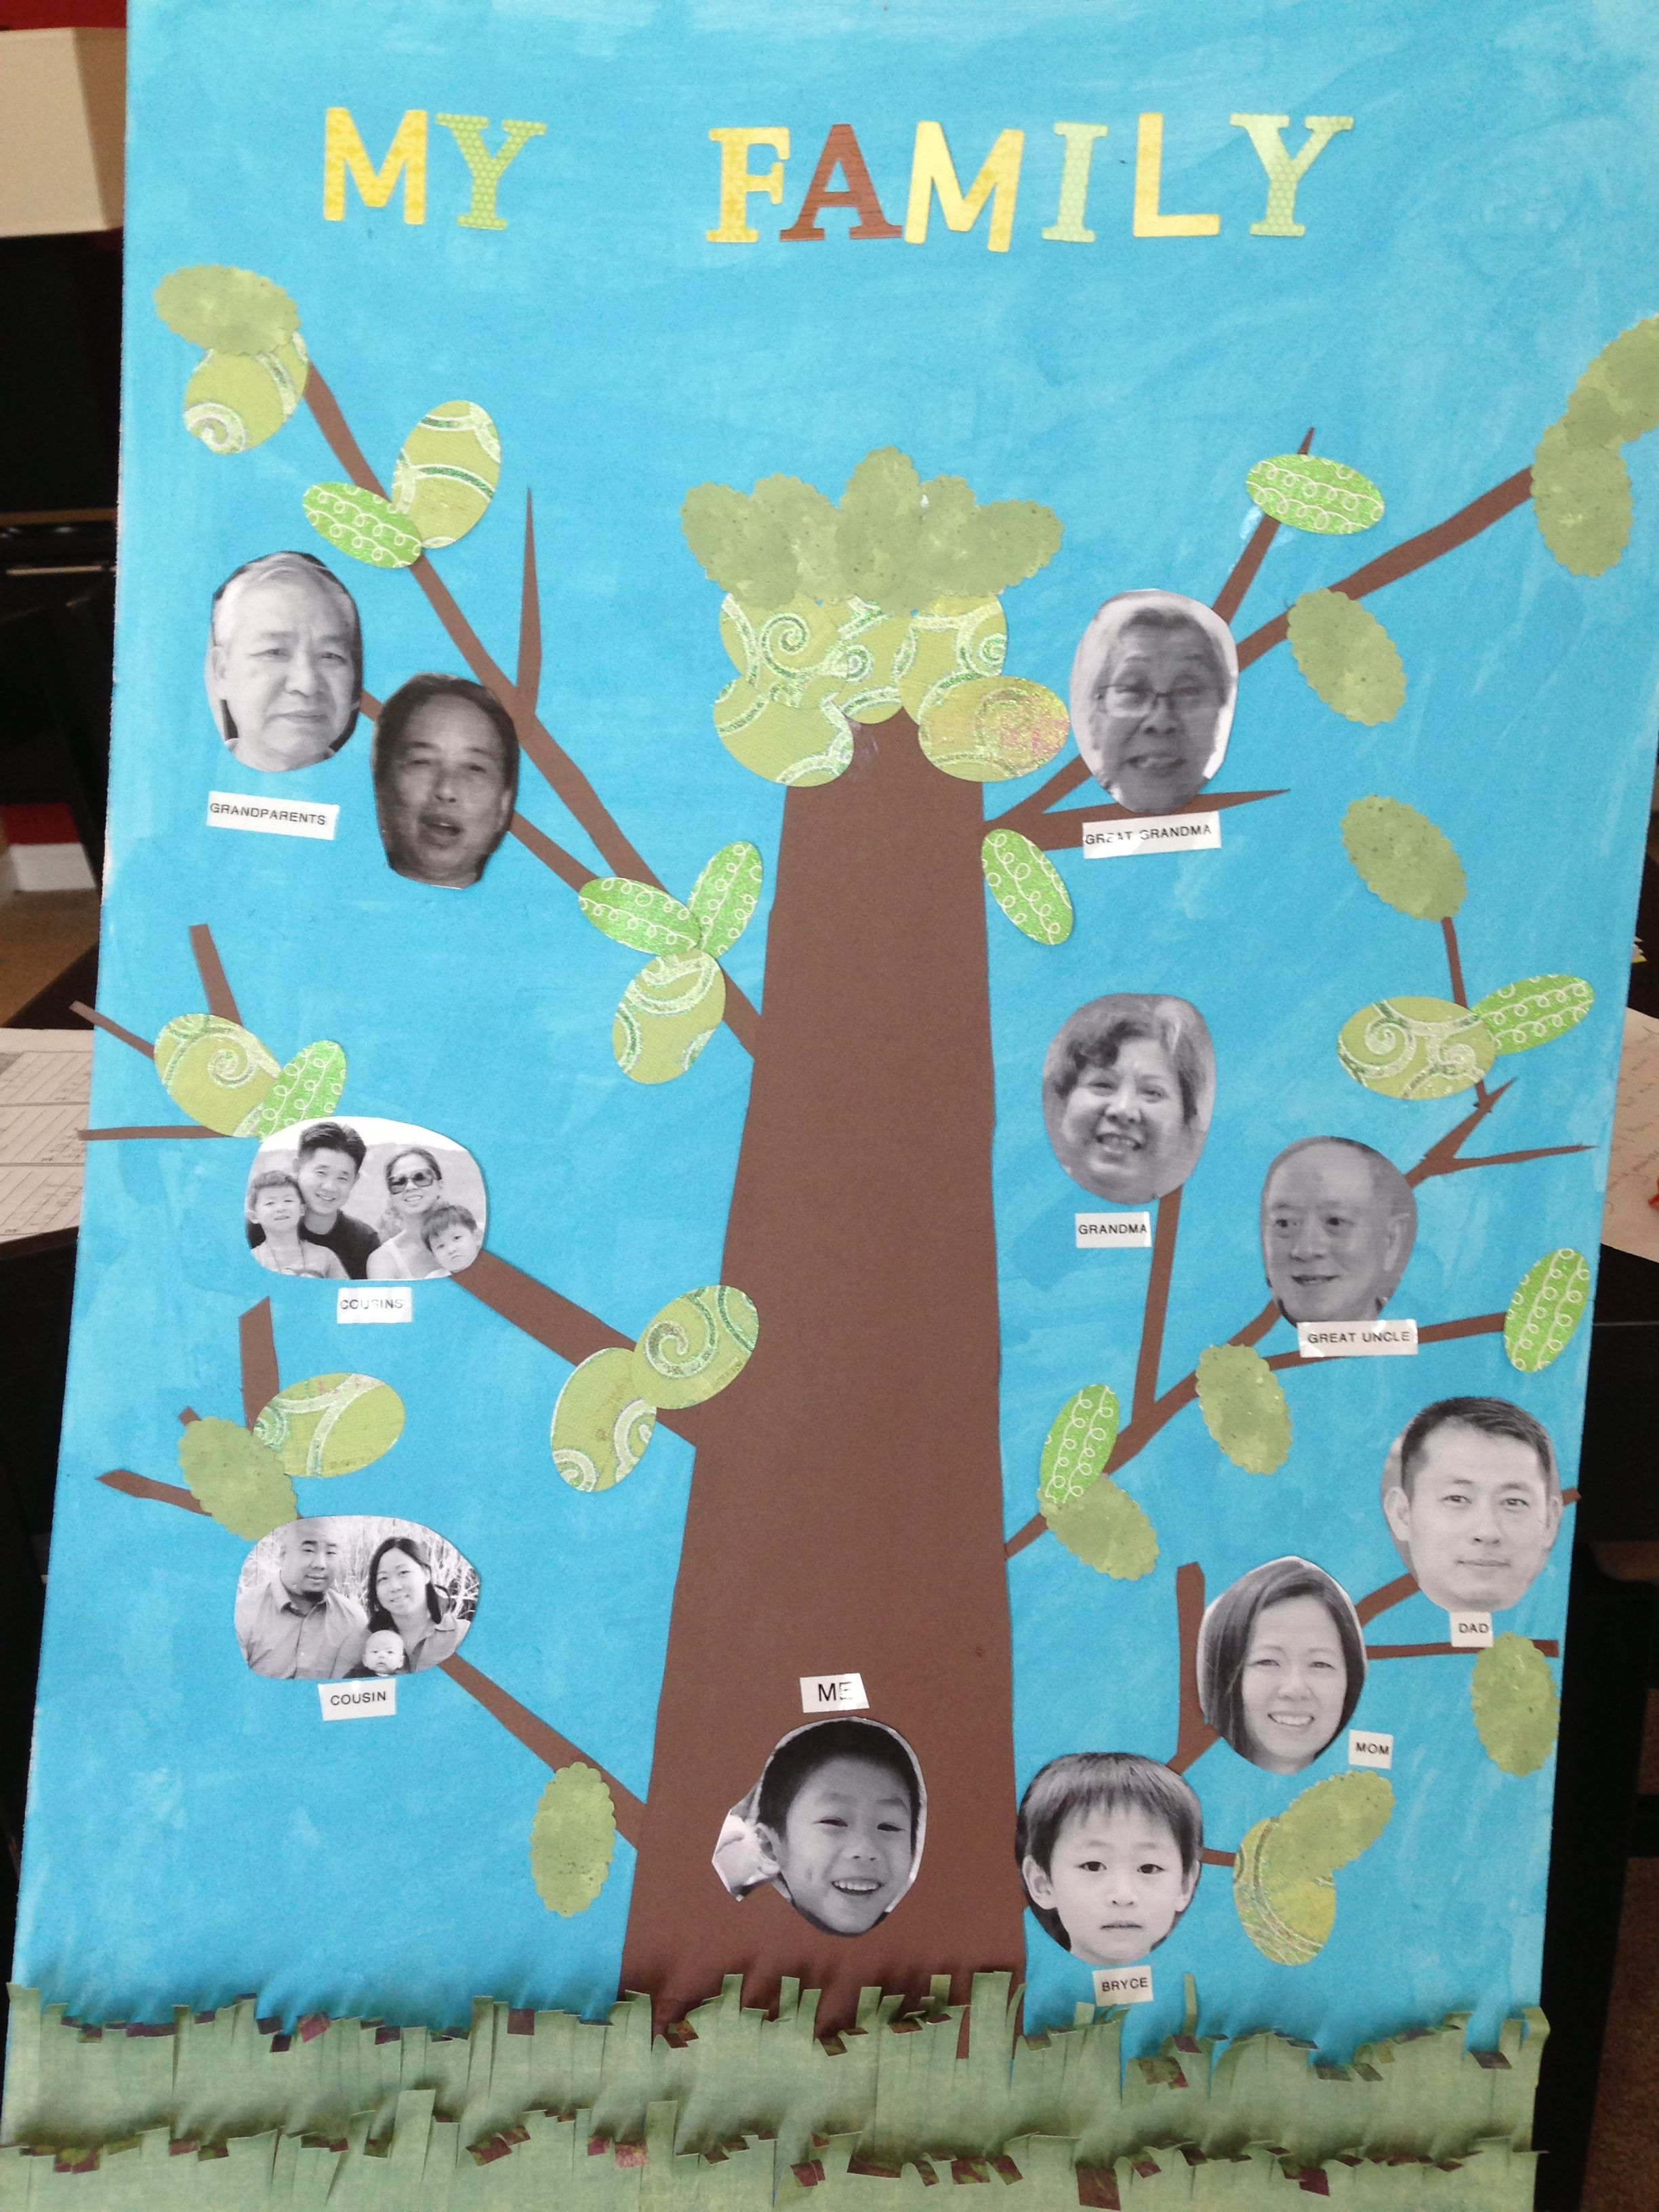 Family tree project kinder basteln pinterest kinder basteln mit kindern und basteln - Stammbaum basteln mit kindern ...